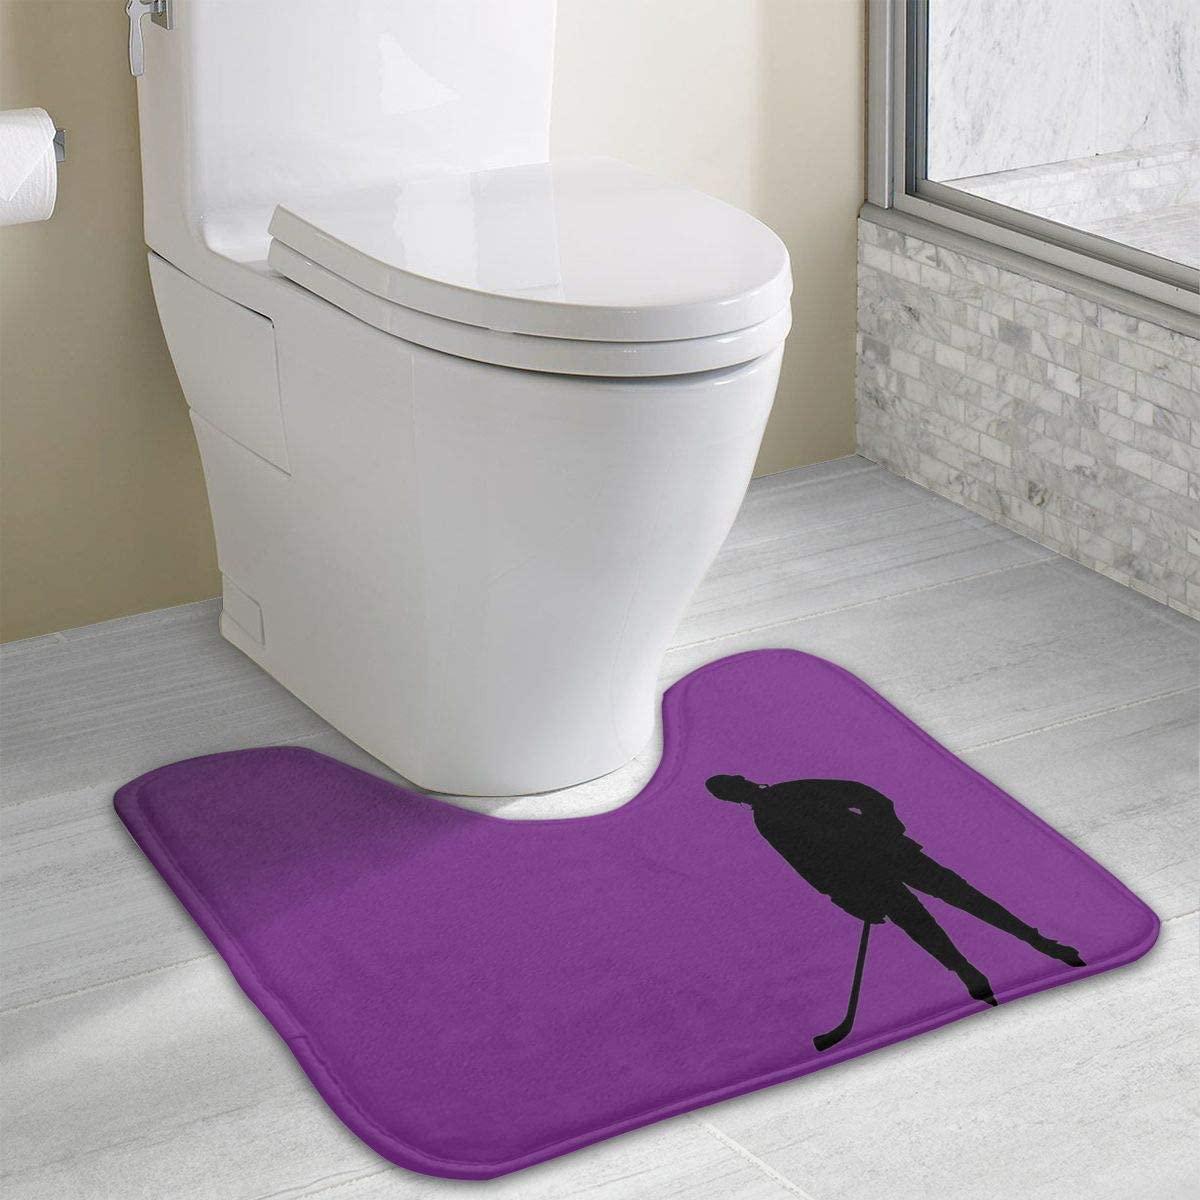 Bathroom Rug, Ice Hockey U-Shaped Non Slip Absorbent Toilet Bath Floor Contour Doormat Shower Mat Carpet 19.3 X 15.7 Inch